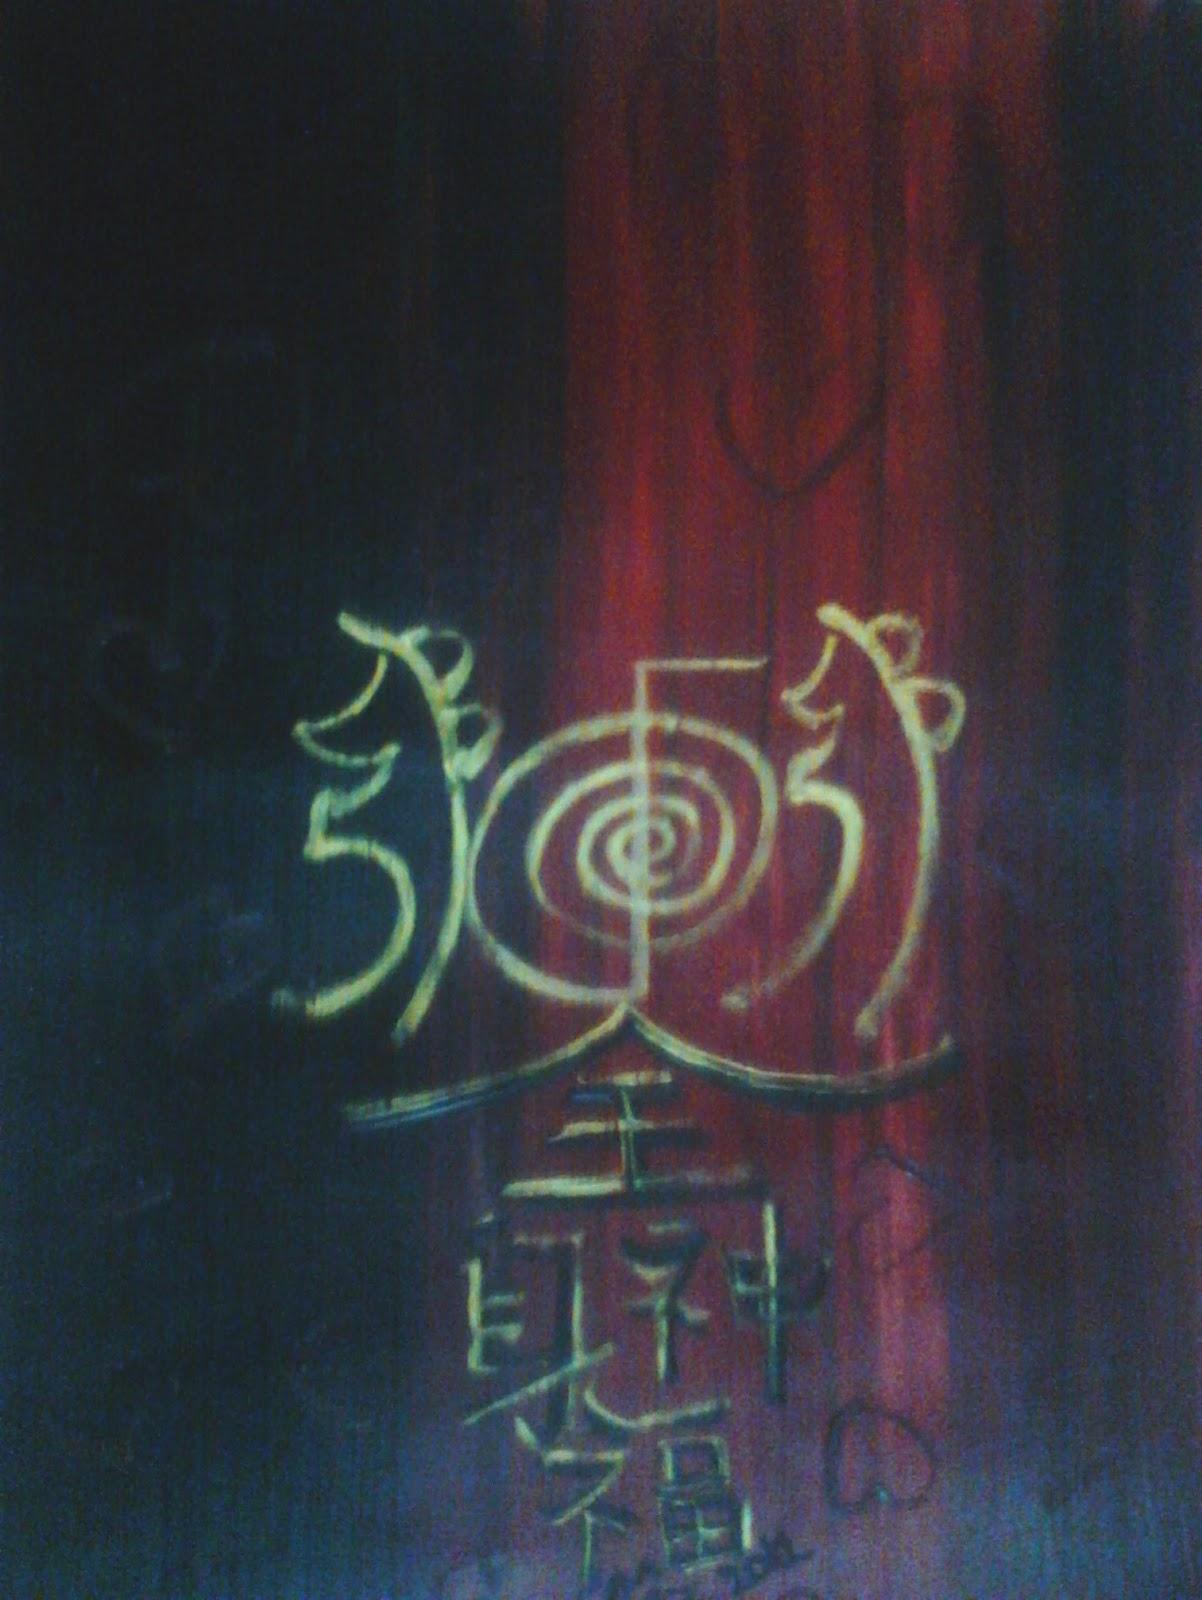 Razarts reiki symbol se he ki meaning and feng shui energy reiki symbol se he ki meaning and feng shui energy biocorpaavc